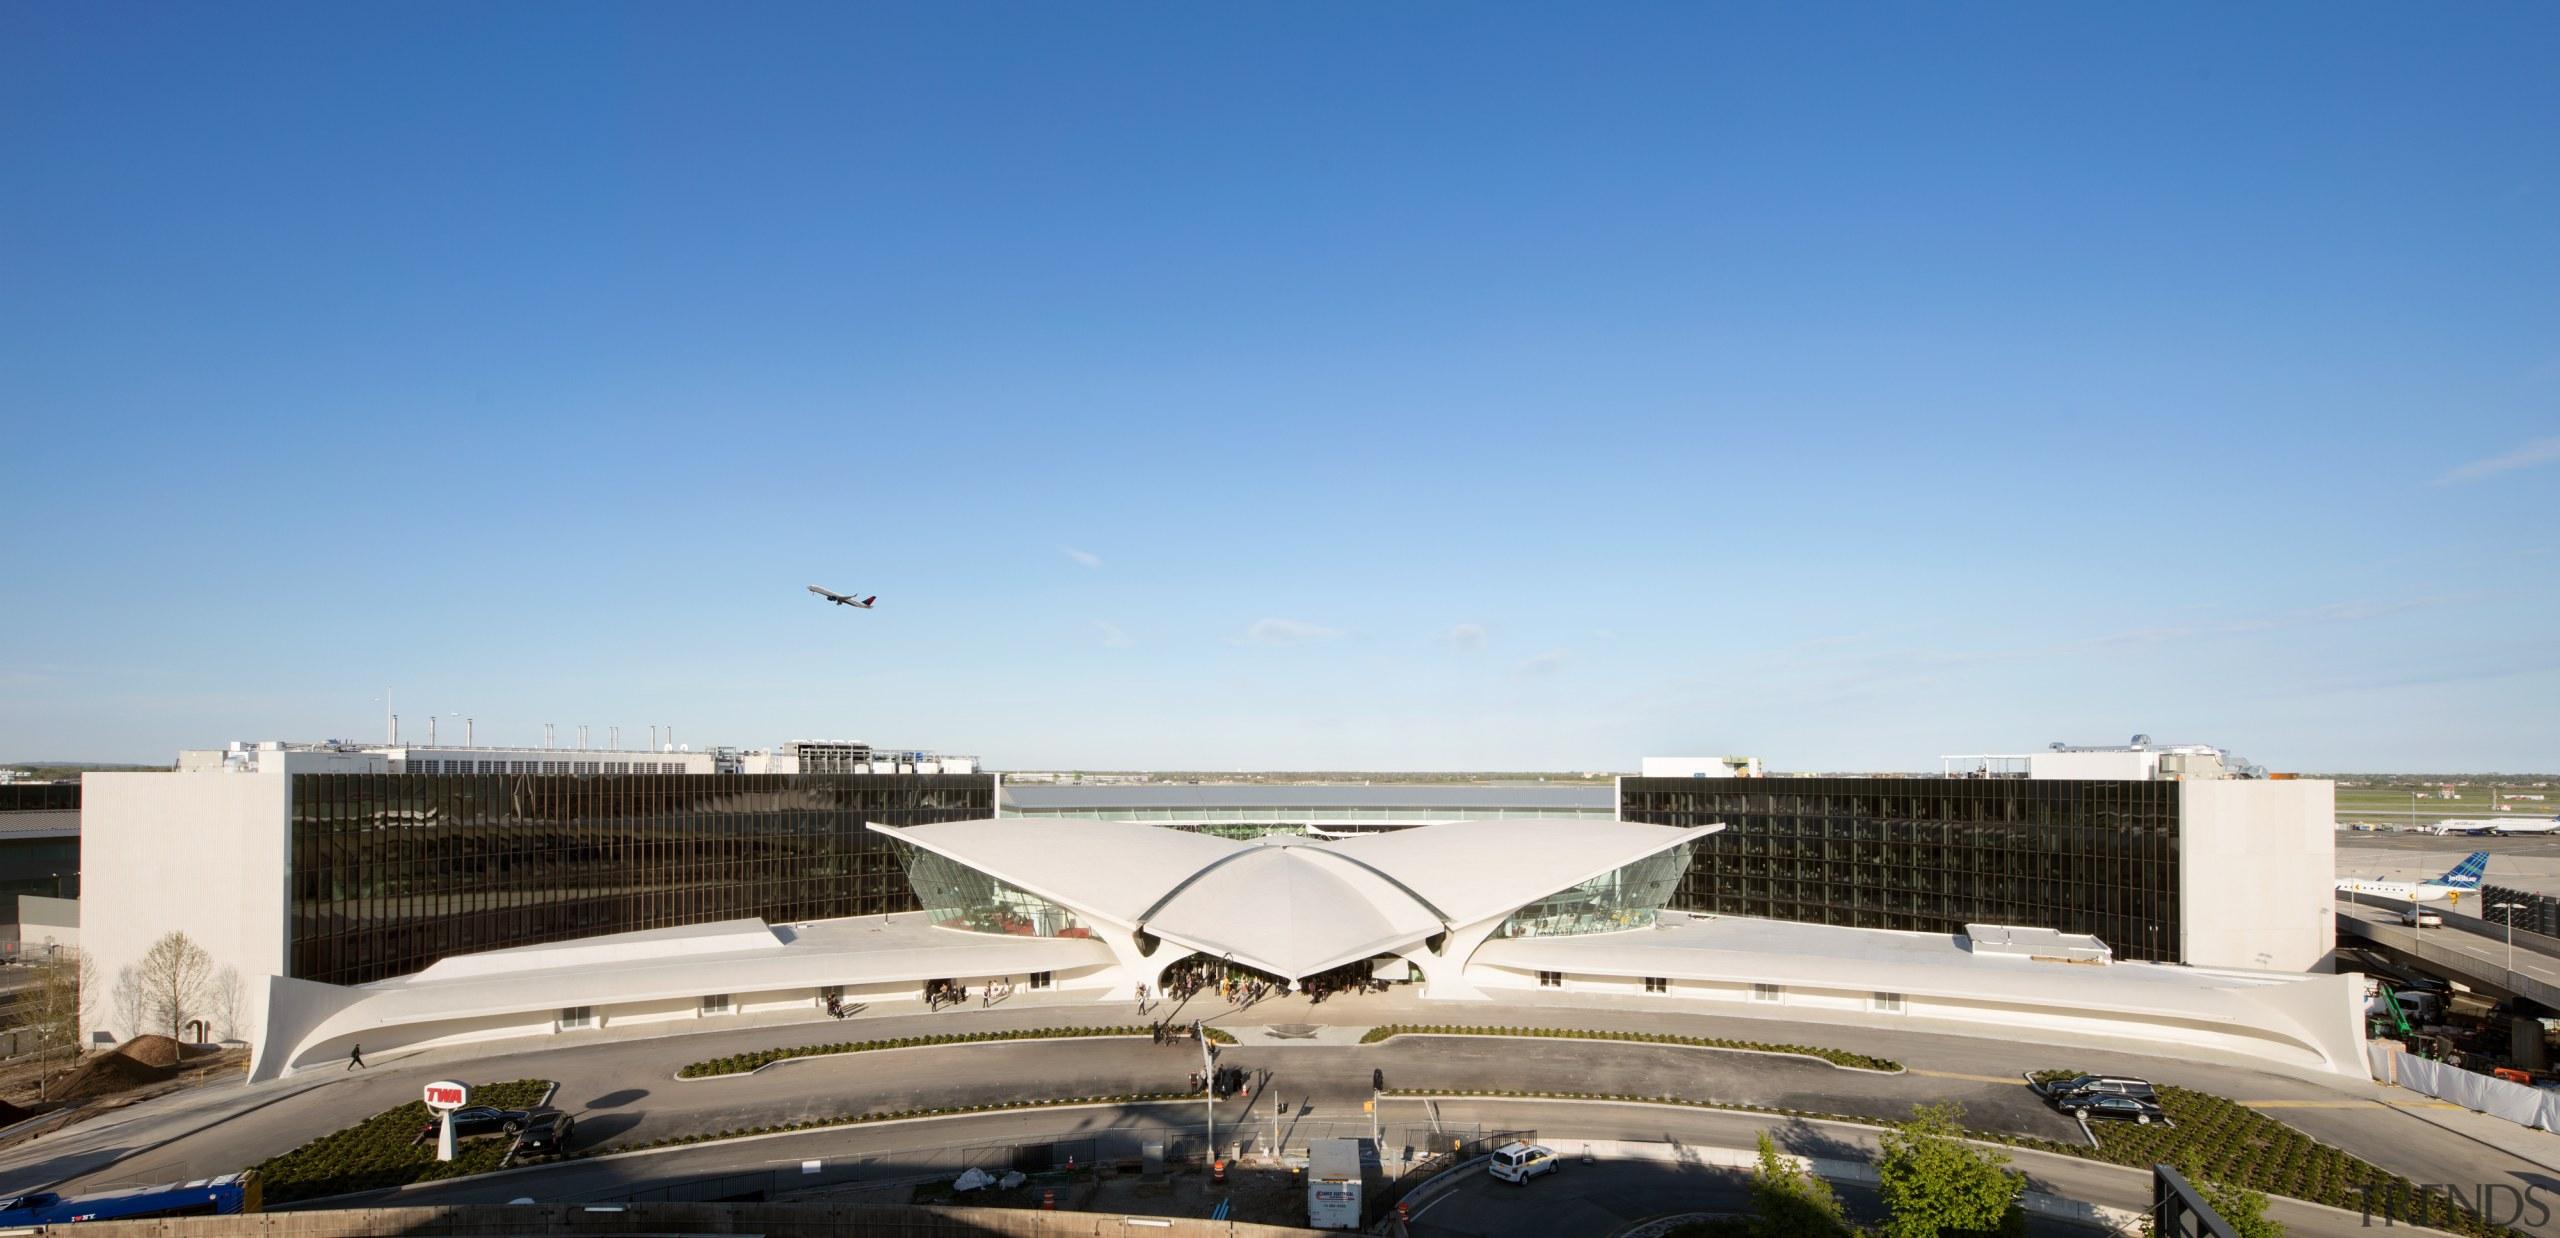 Two brand new wings behind Eero Saarinen's historic aerospace engineering, air travel, aircraft, airline, airliner, airplane, airport, airport apron, TWA Hotel